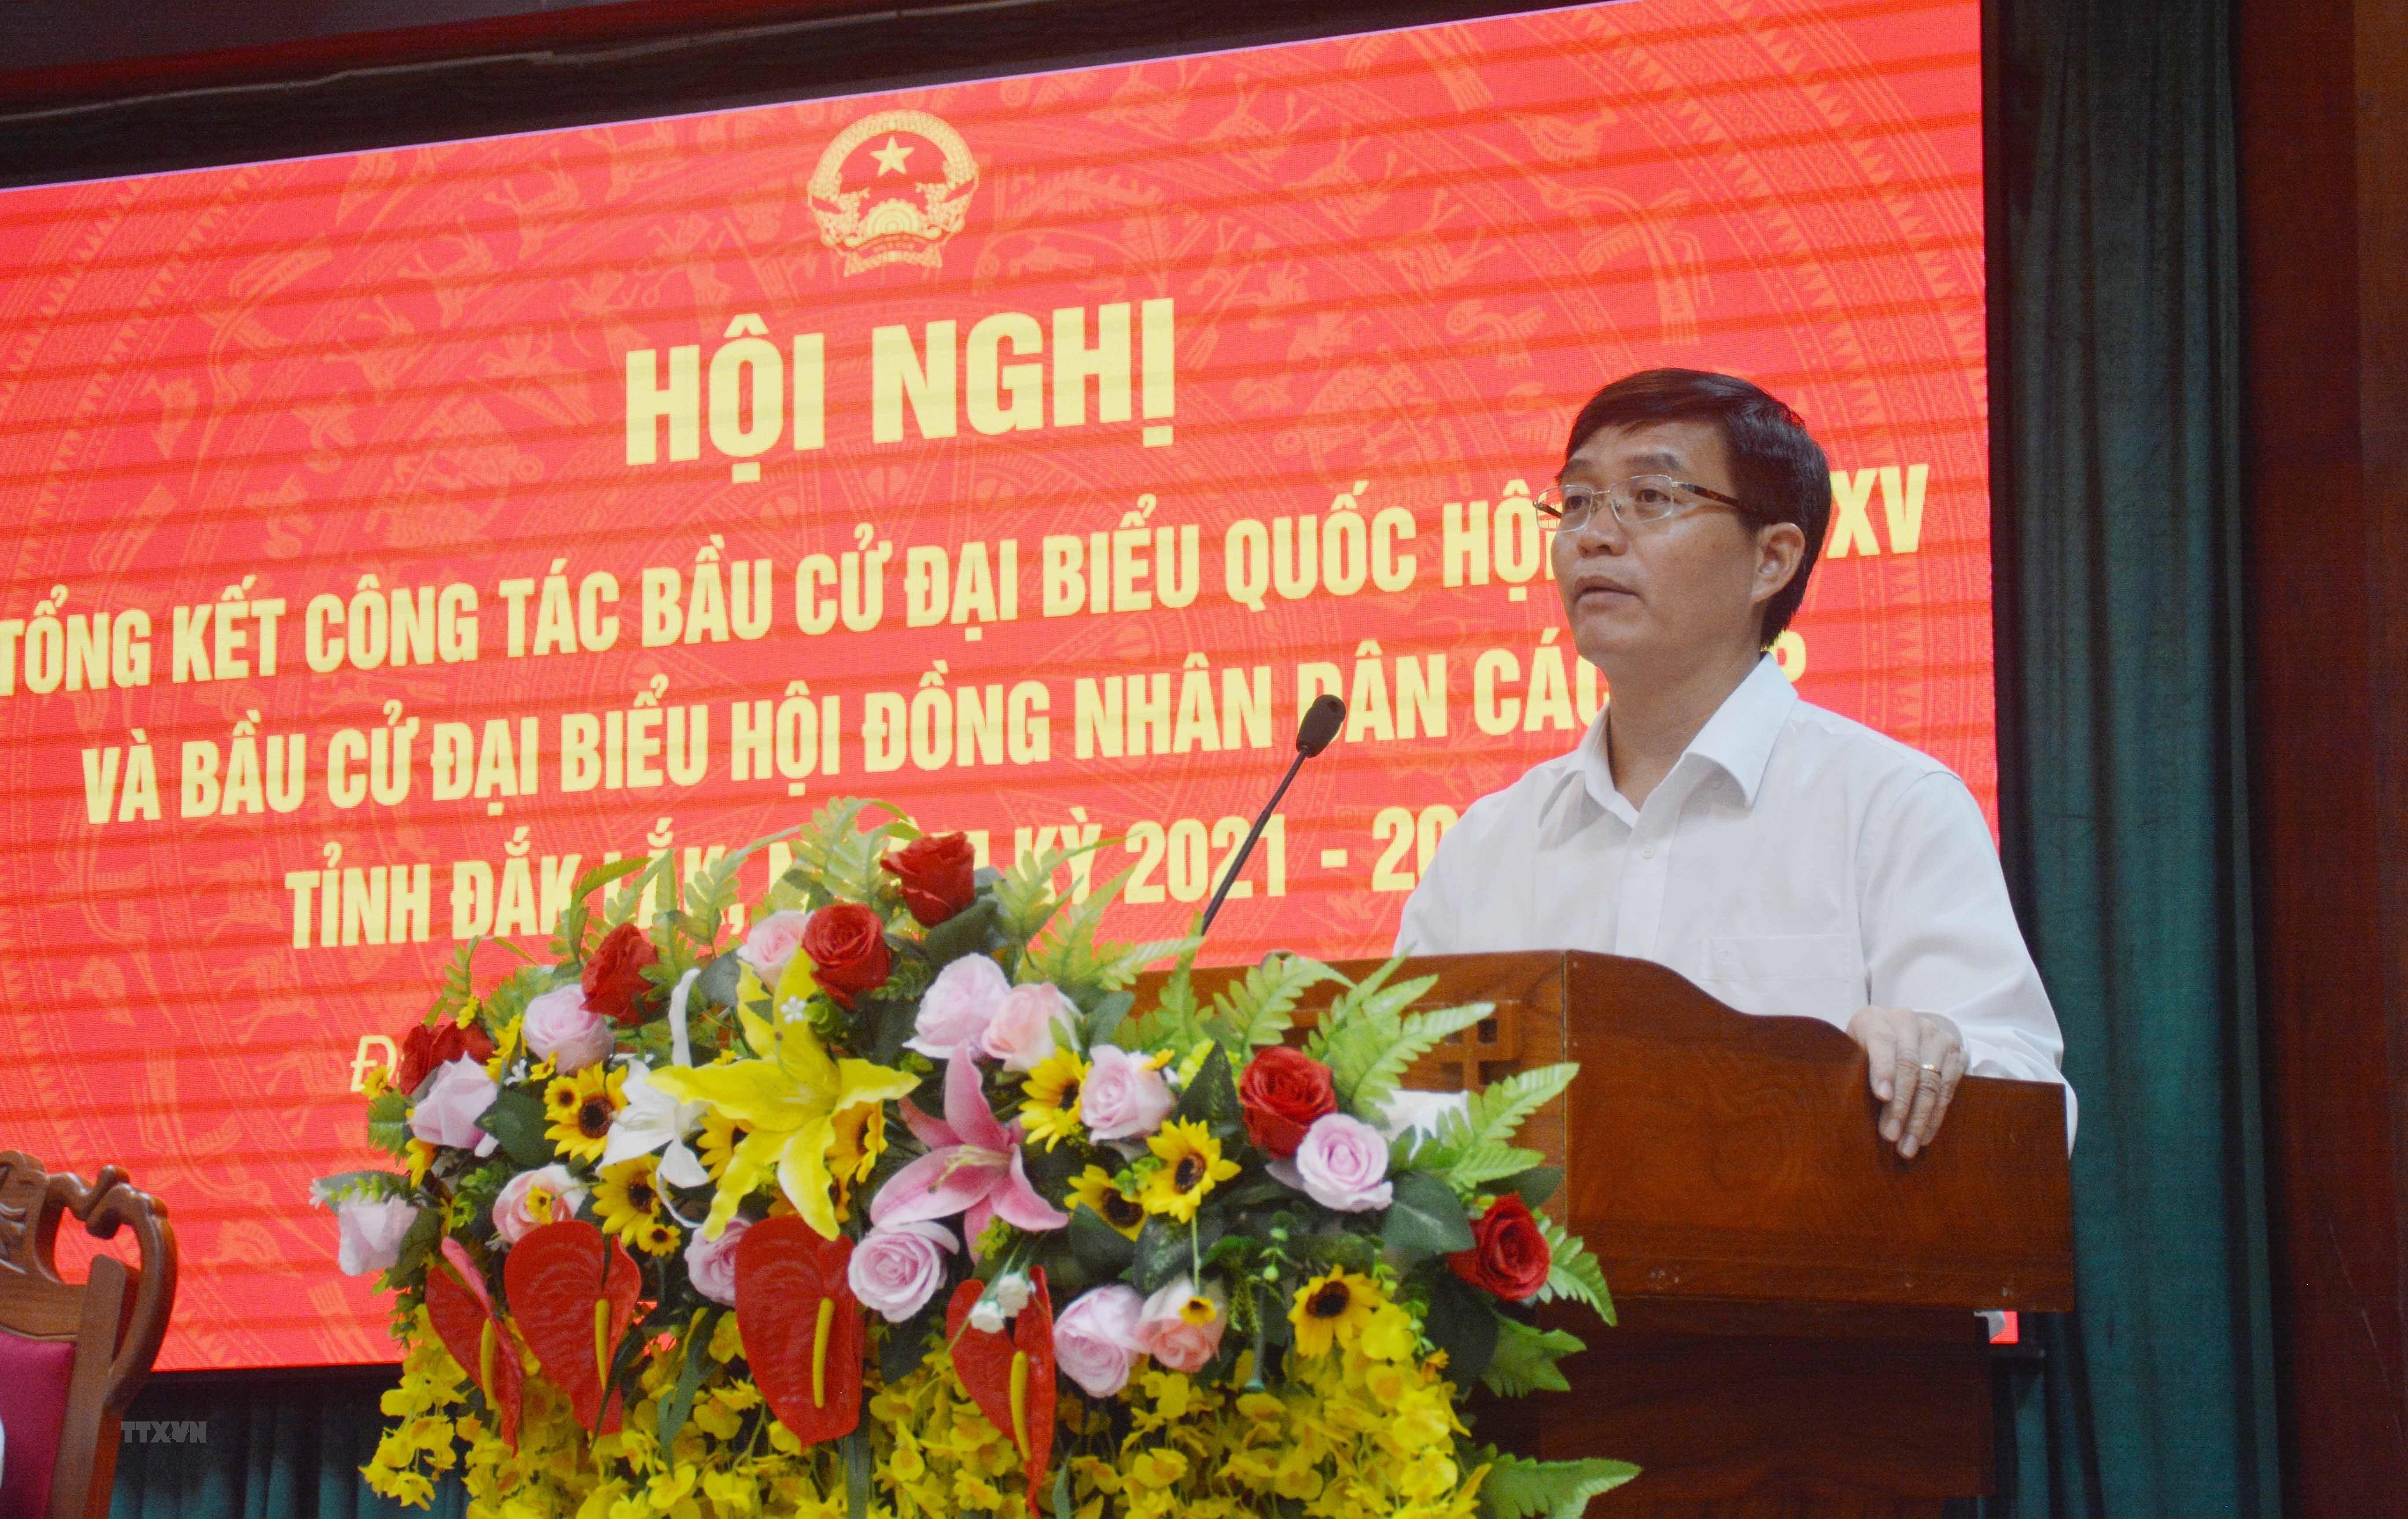 Ninh Binh bau cac chuc danh chu chot, Dak Lak tong ket cong tac bau cu hinh anh 2